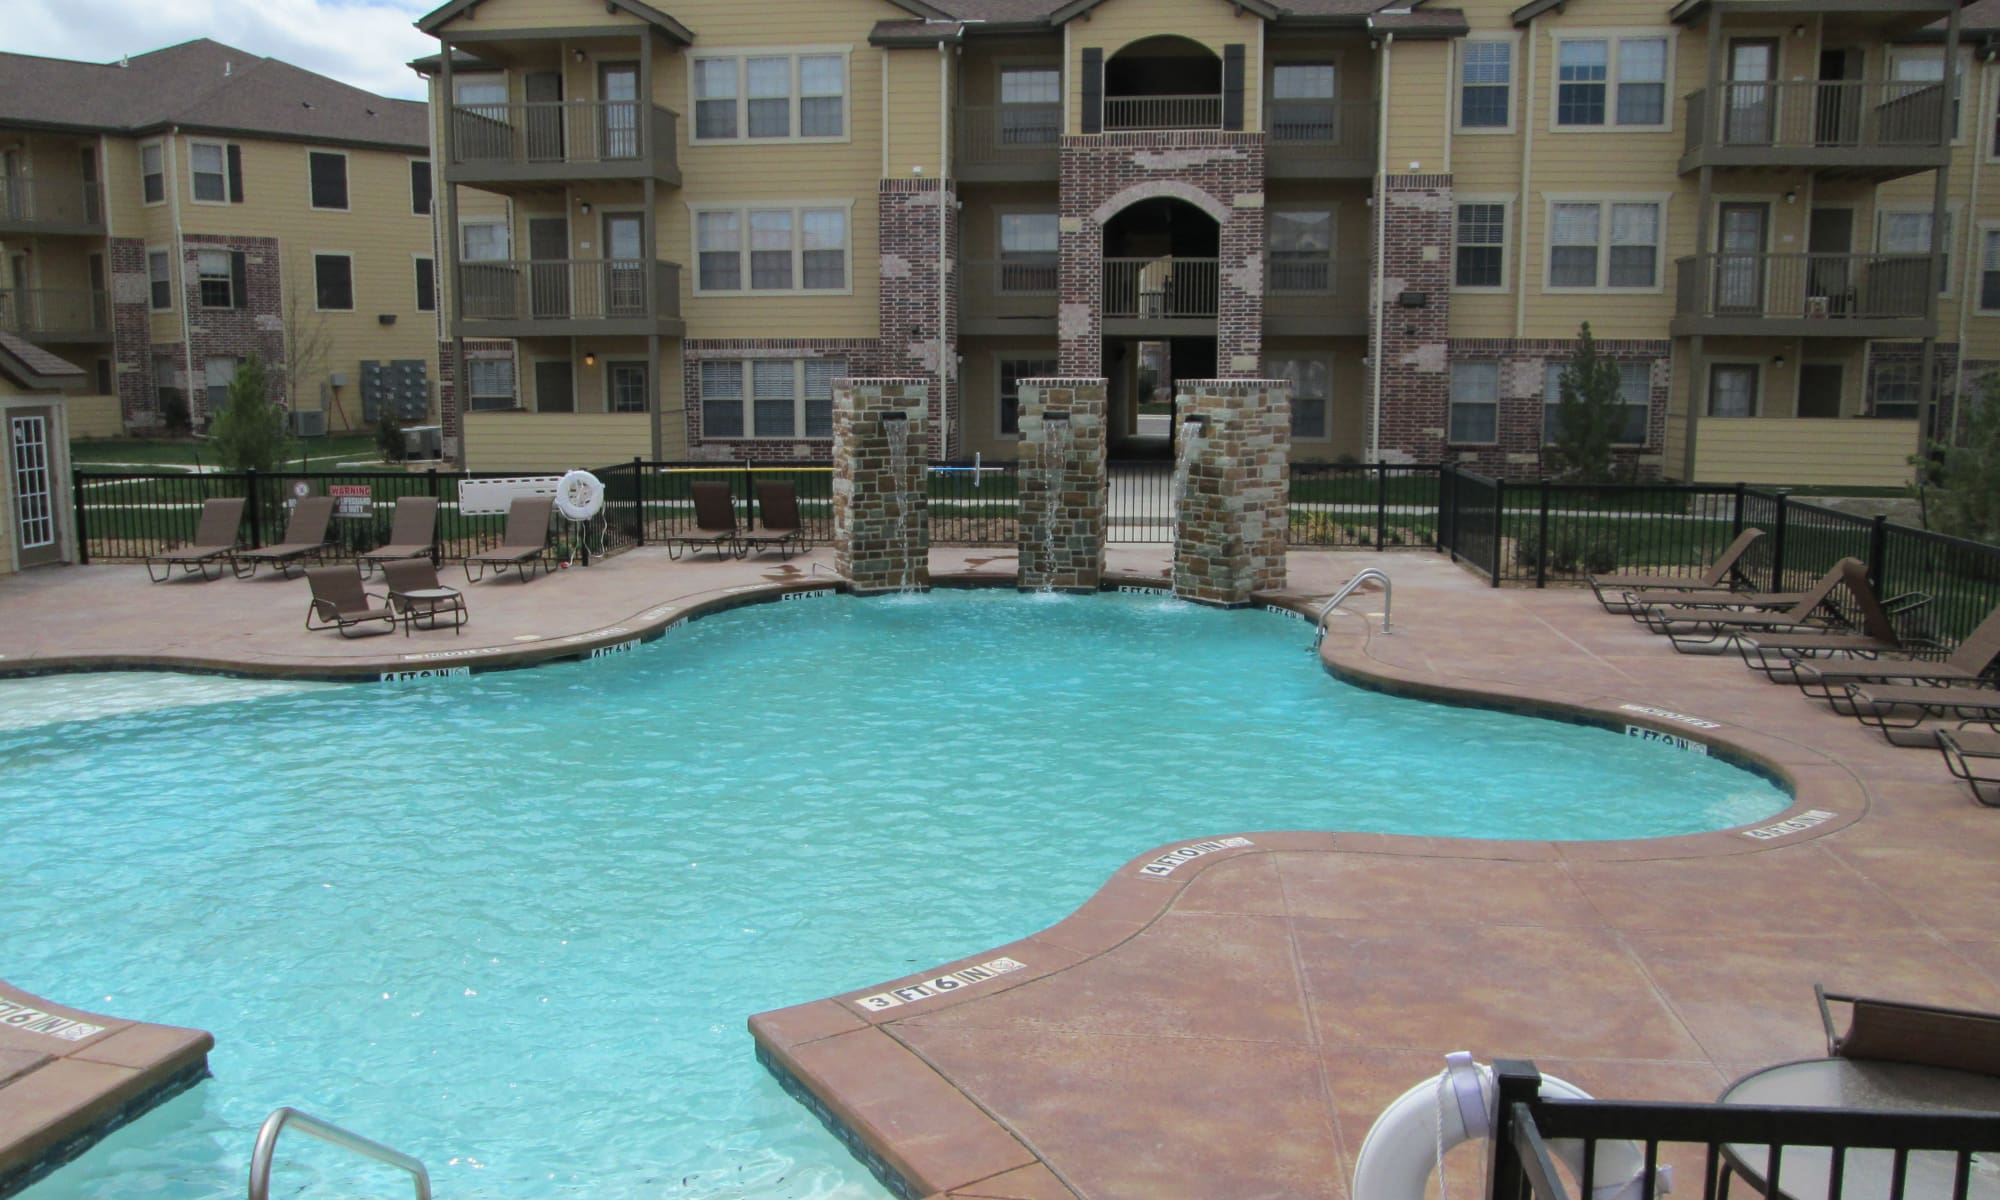 Apartments at Park at Coulterin Amarillo, Texas